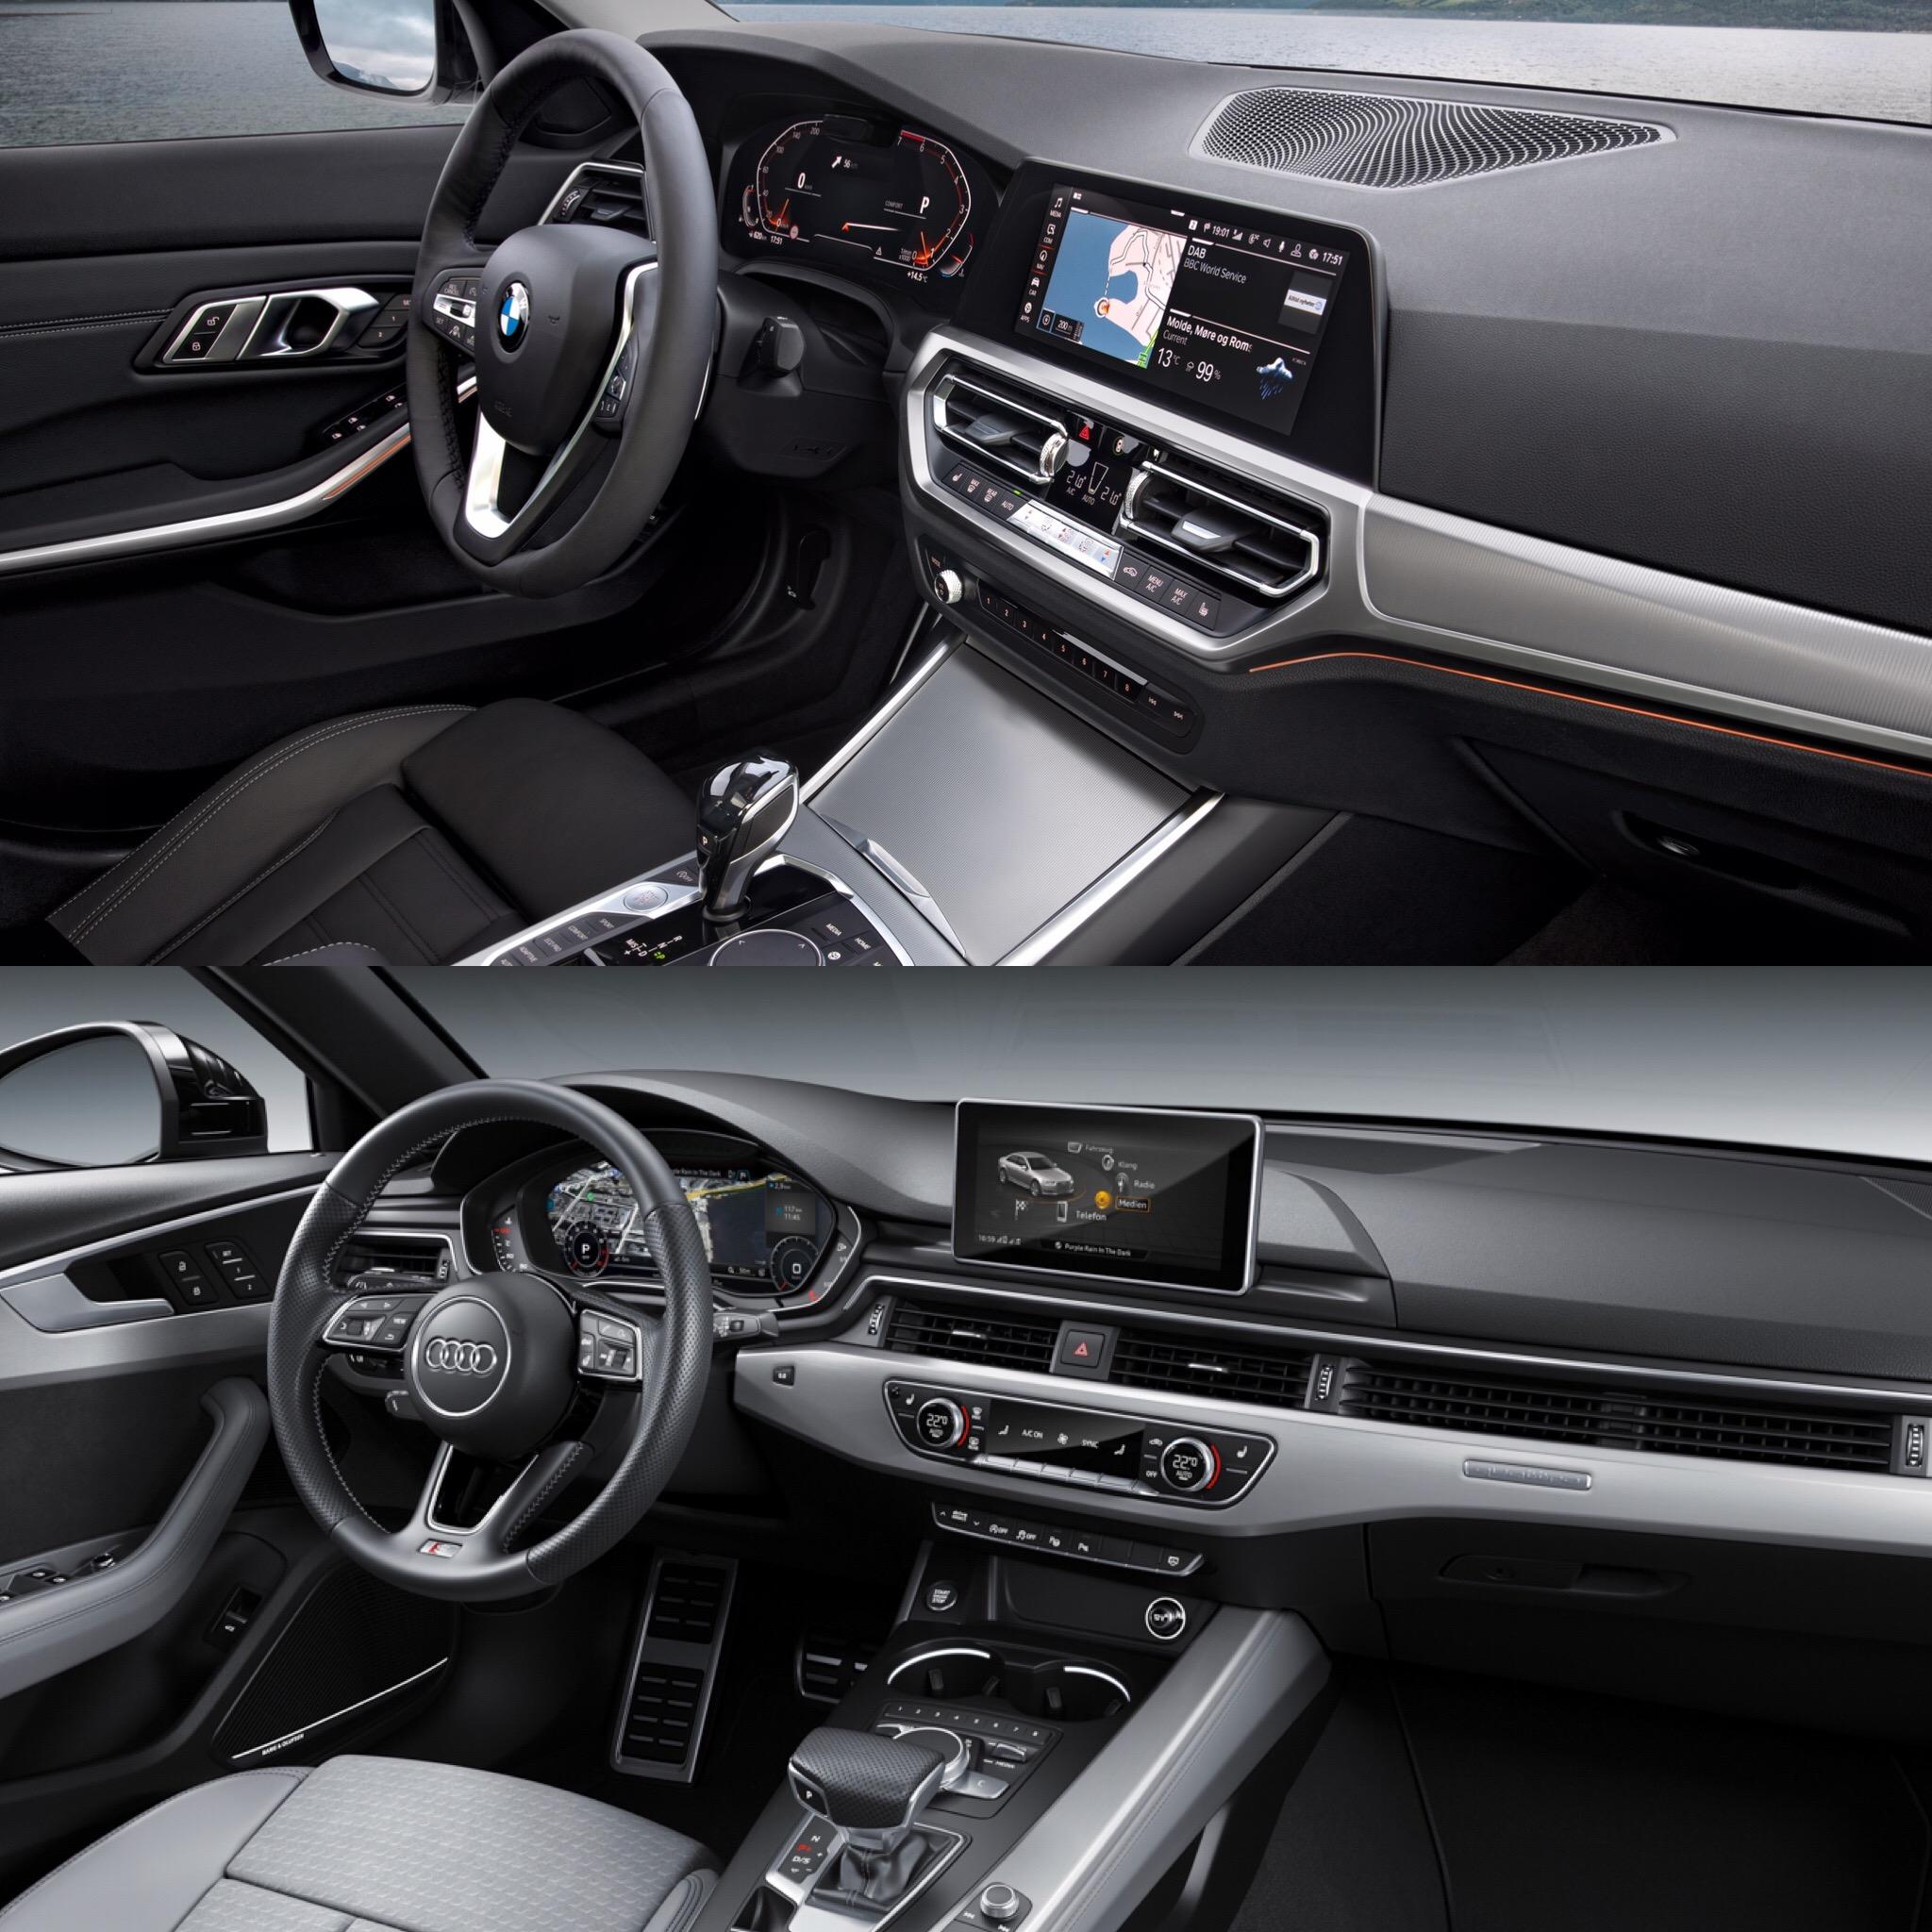 Photo Comparison G20 Bmw 3 Series Vs Facelifted Audi A4